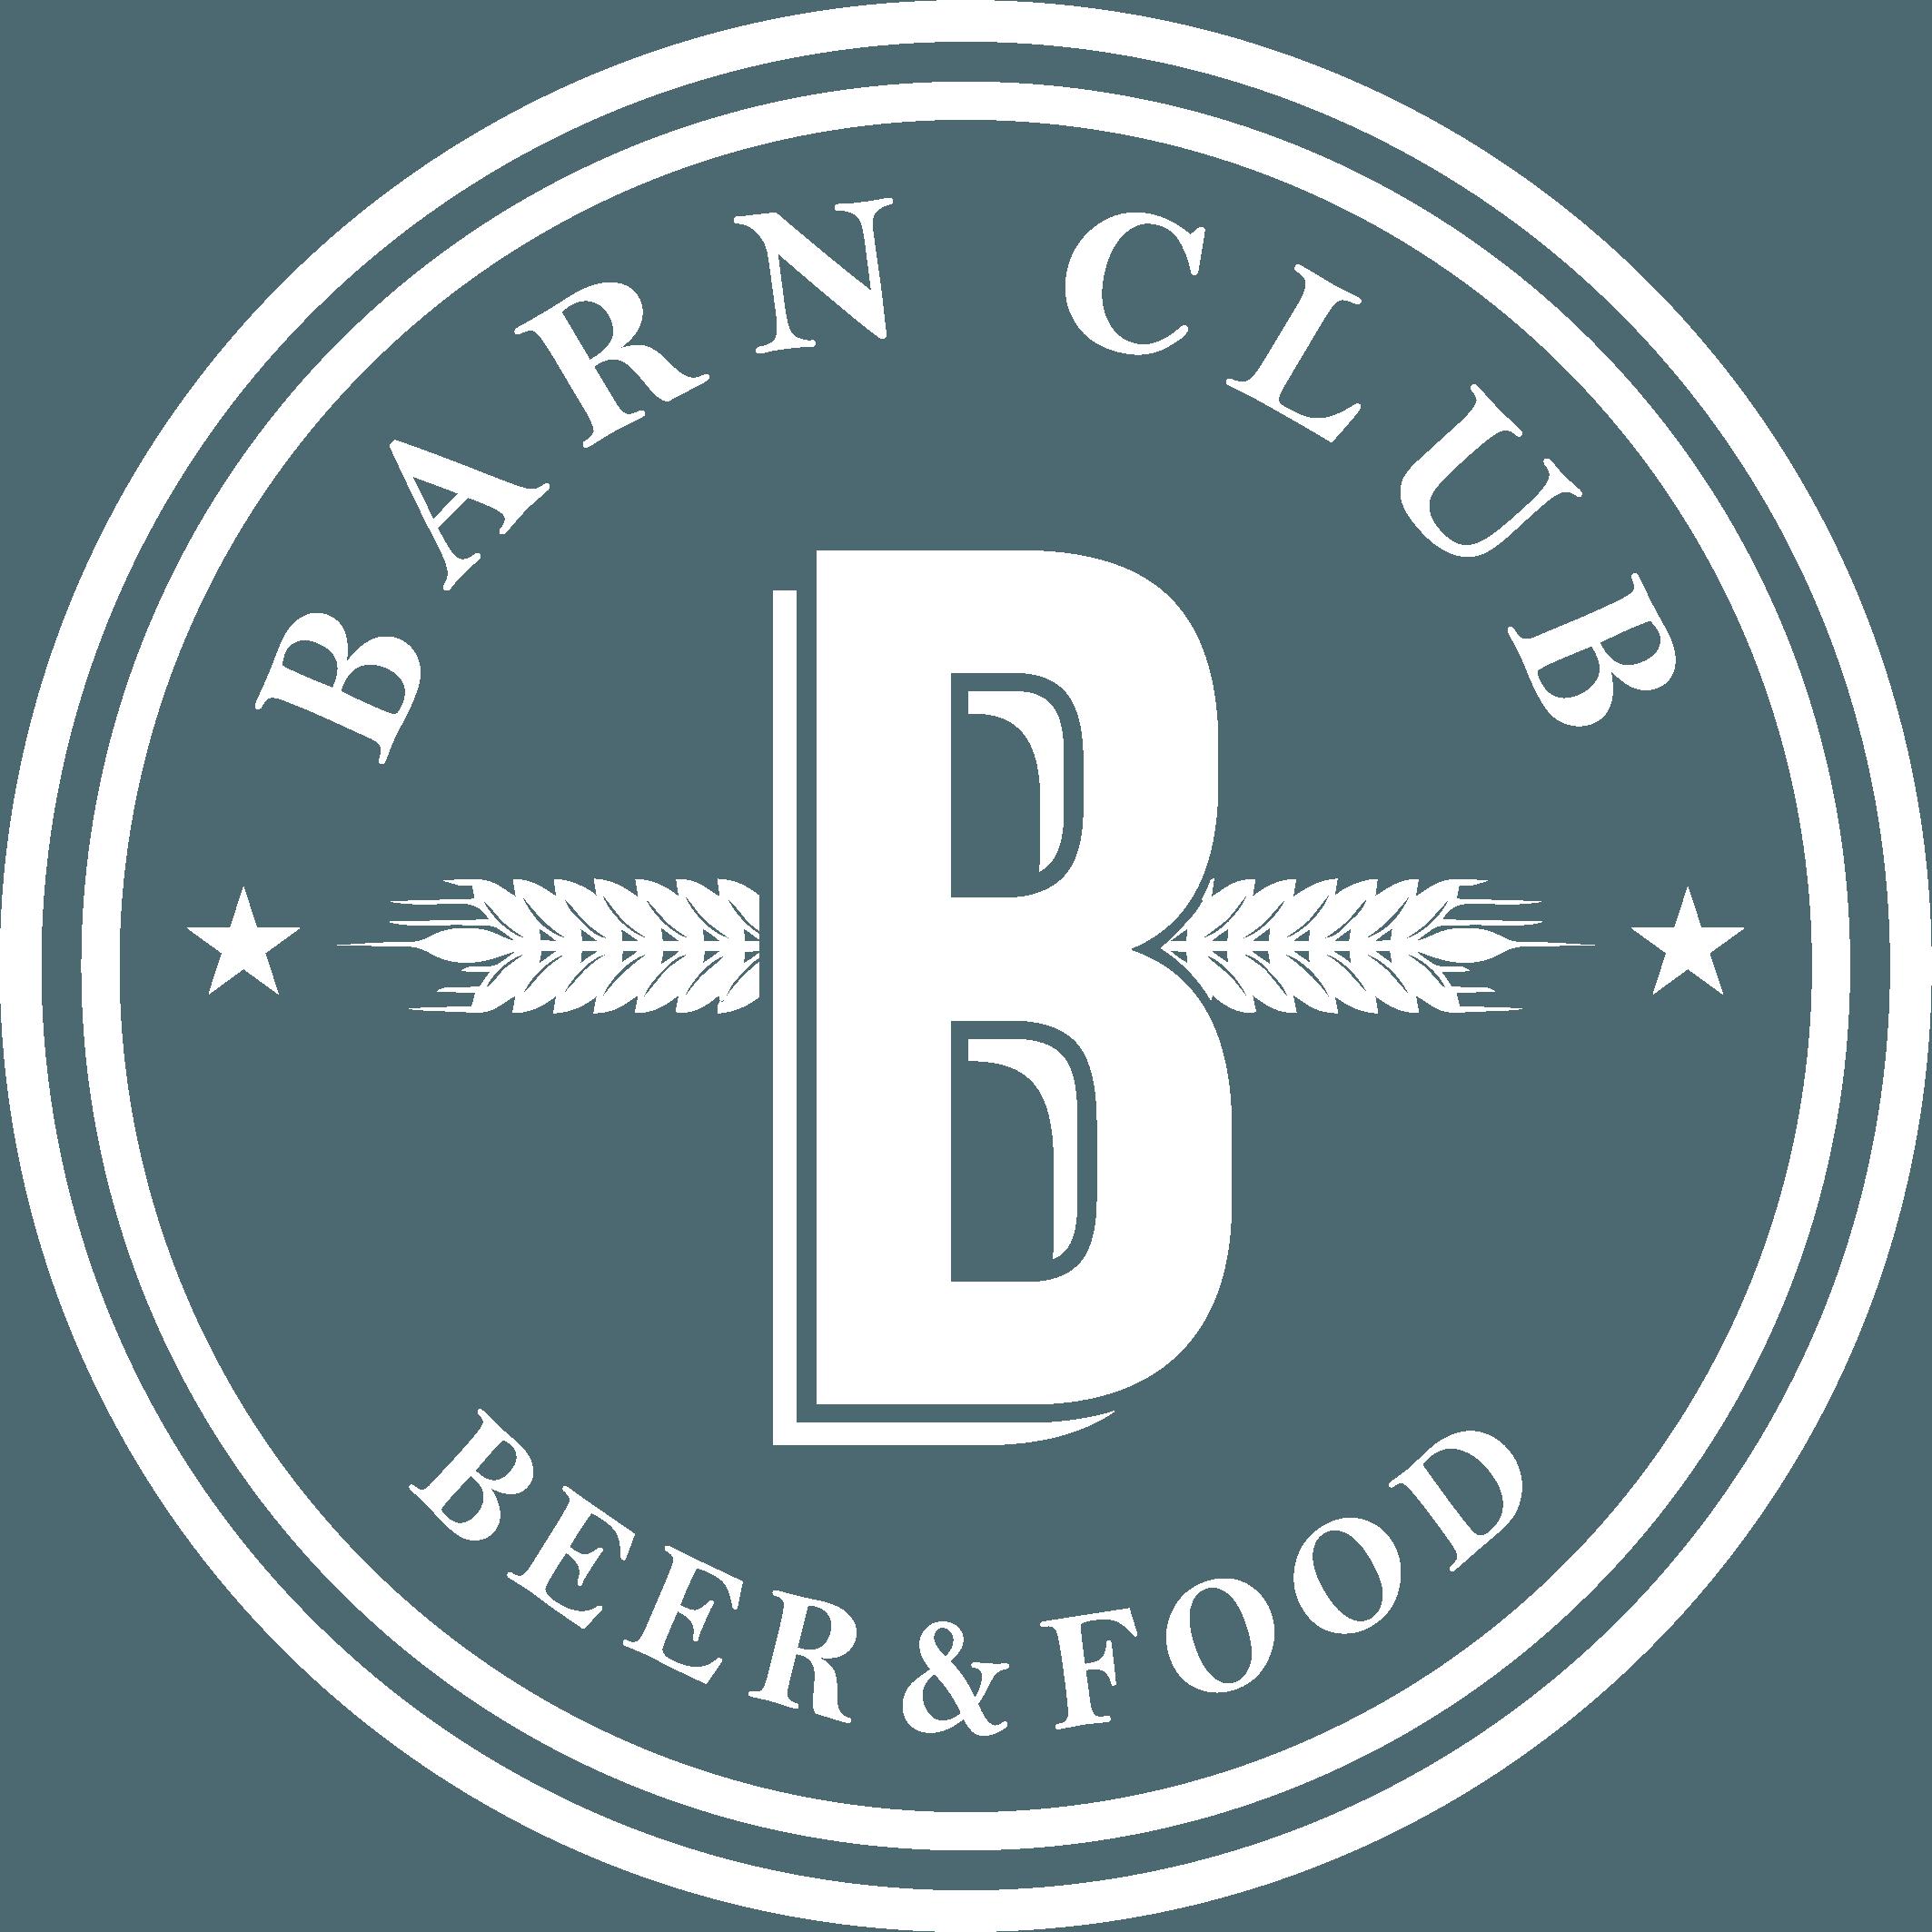 Barn Club Poprad